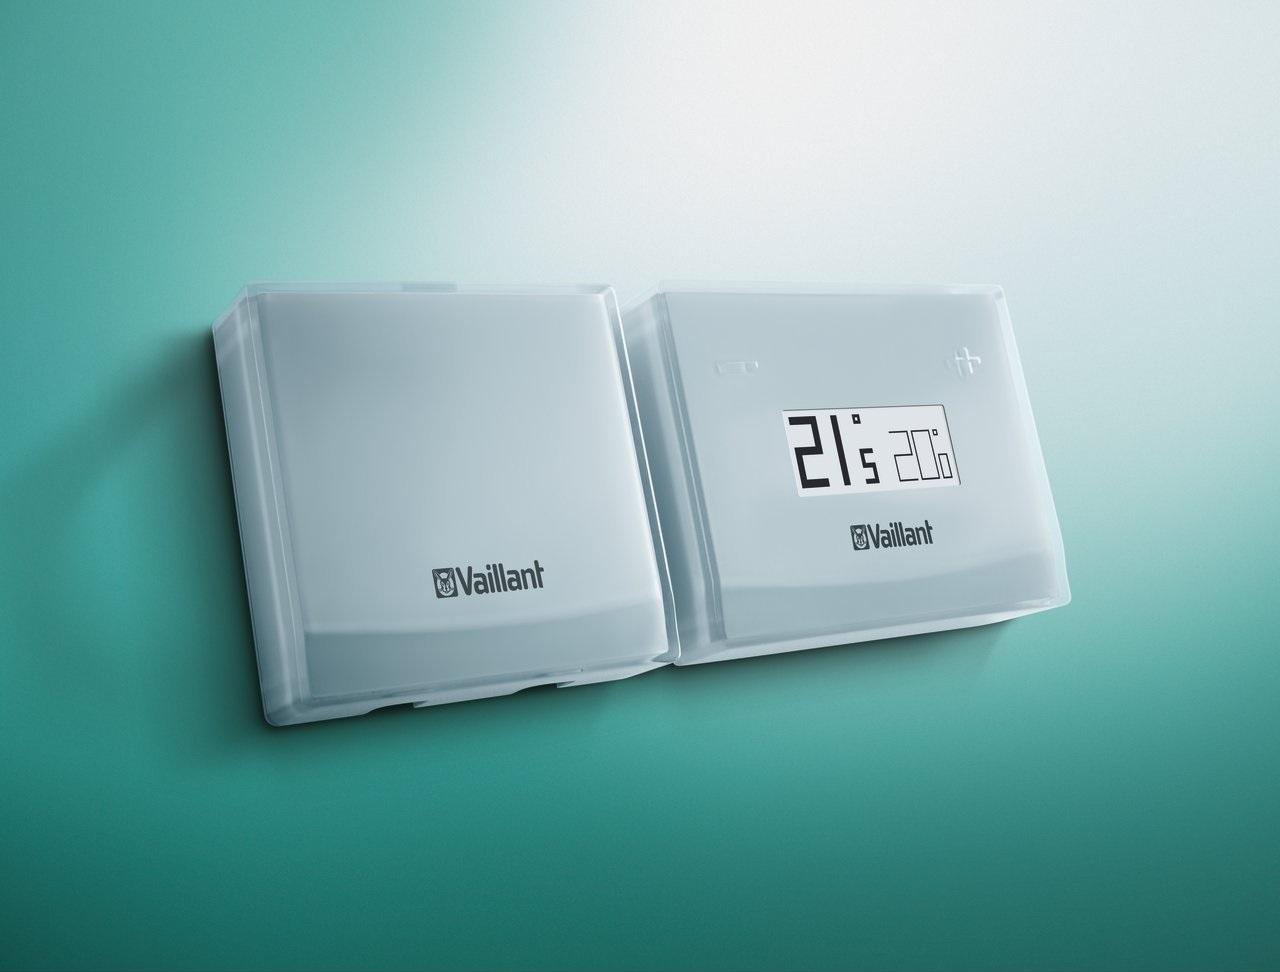 Vaillant termostato wifi openclima calderas de gas - Caldera de calefaccion ...